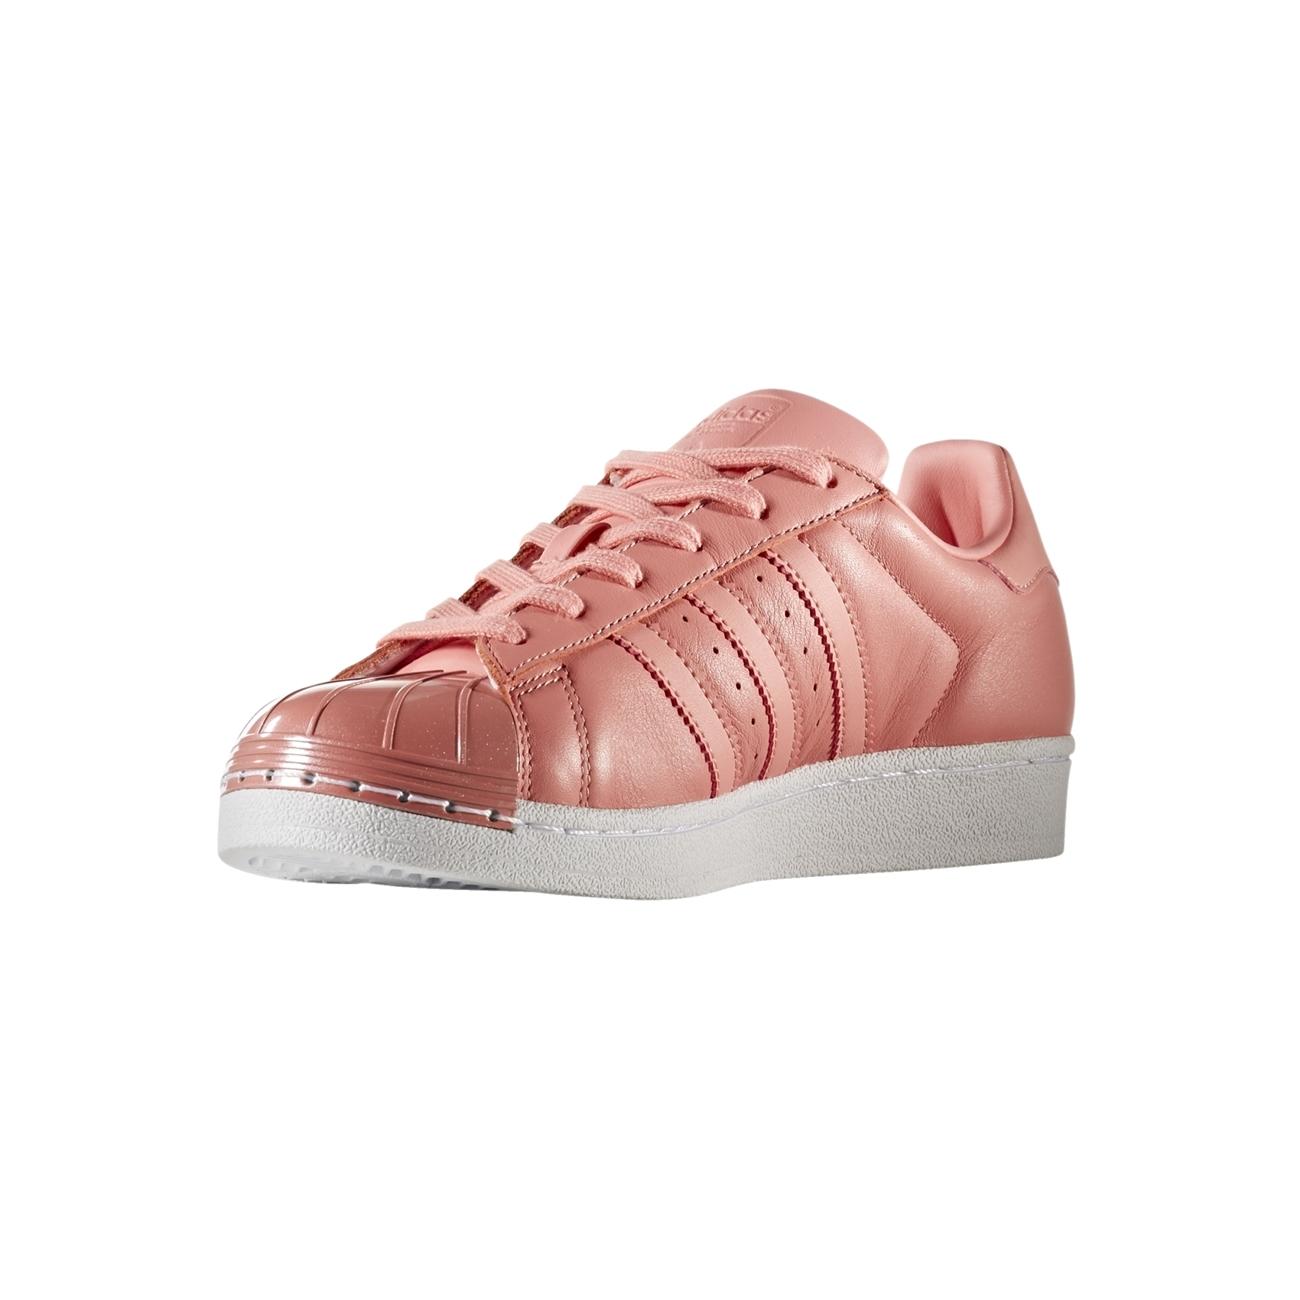 adidas superstar 80s rose